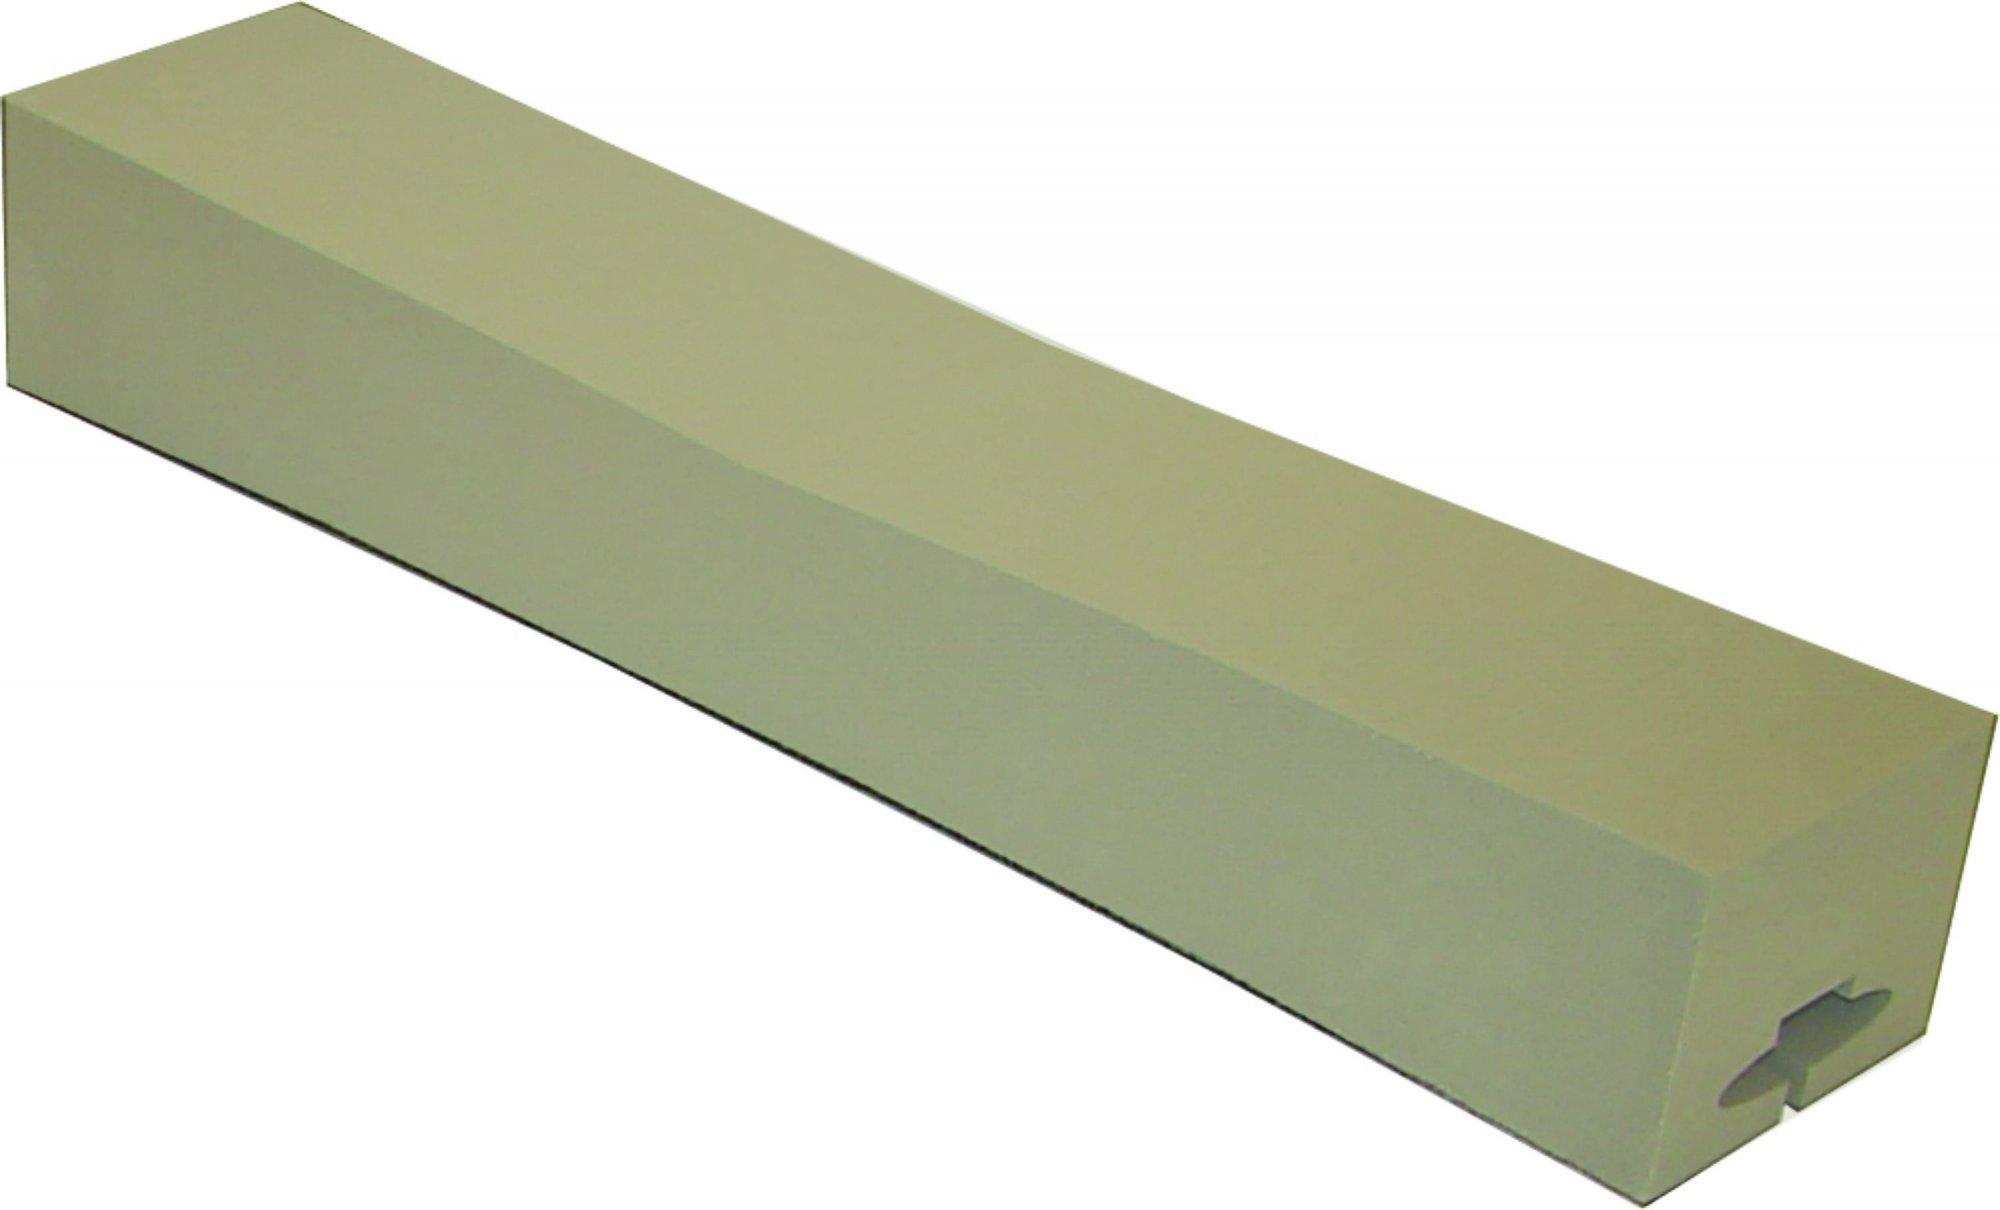 Malone Kayak/SUP Block, 4 X 4.75 X 24